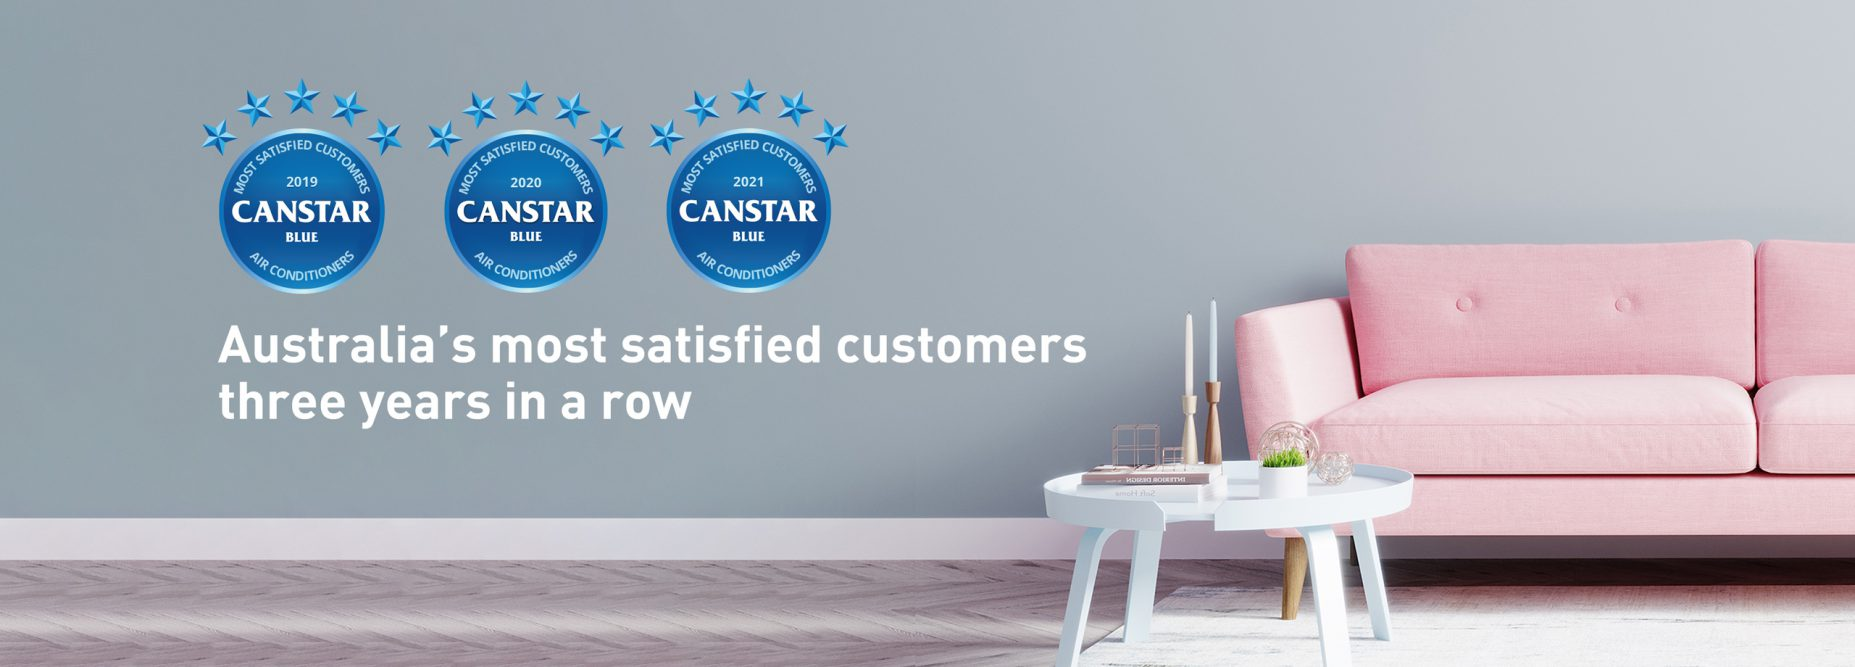 canstar blue most satisfied customer award desktop banner